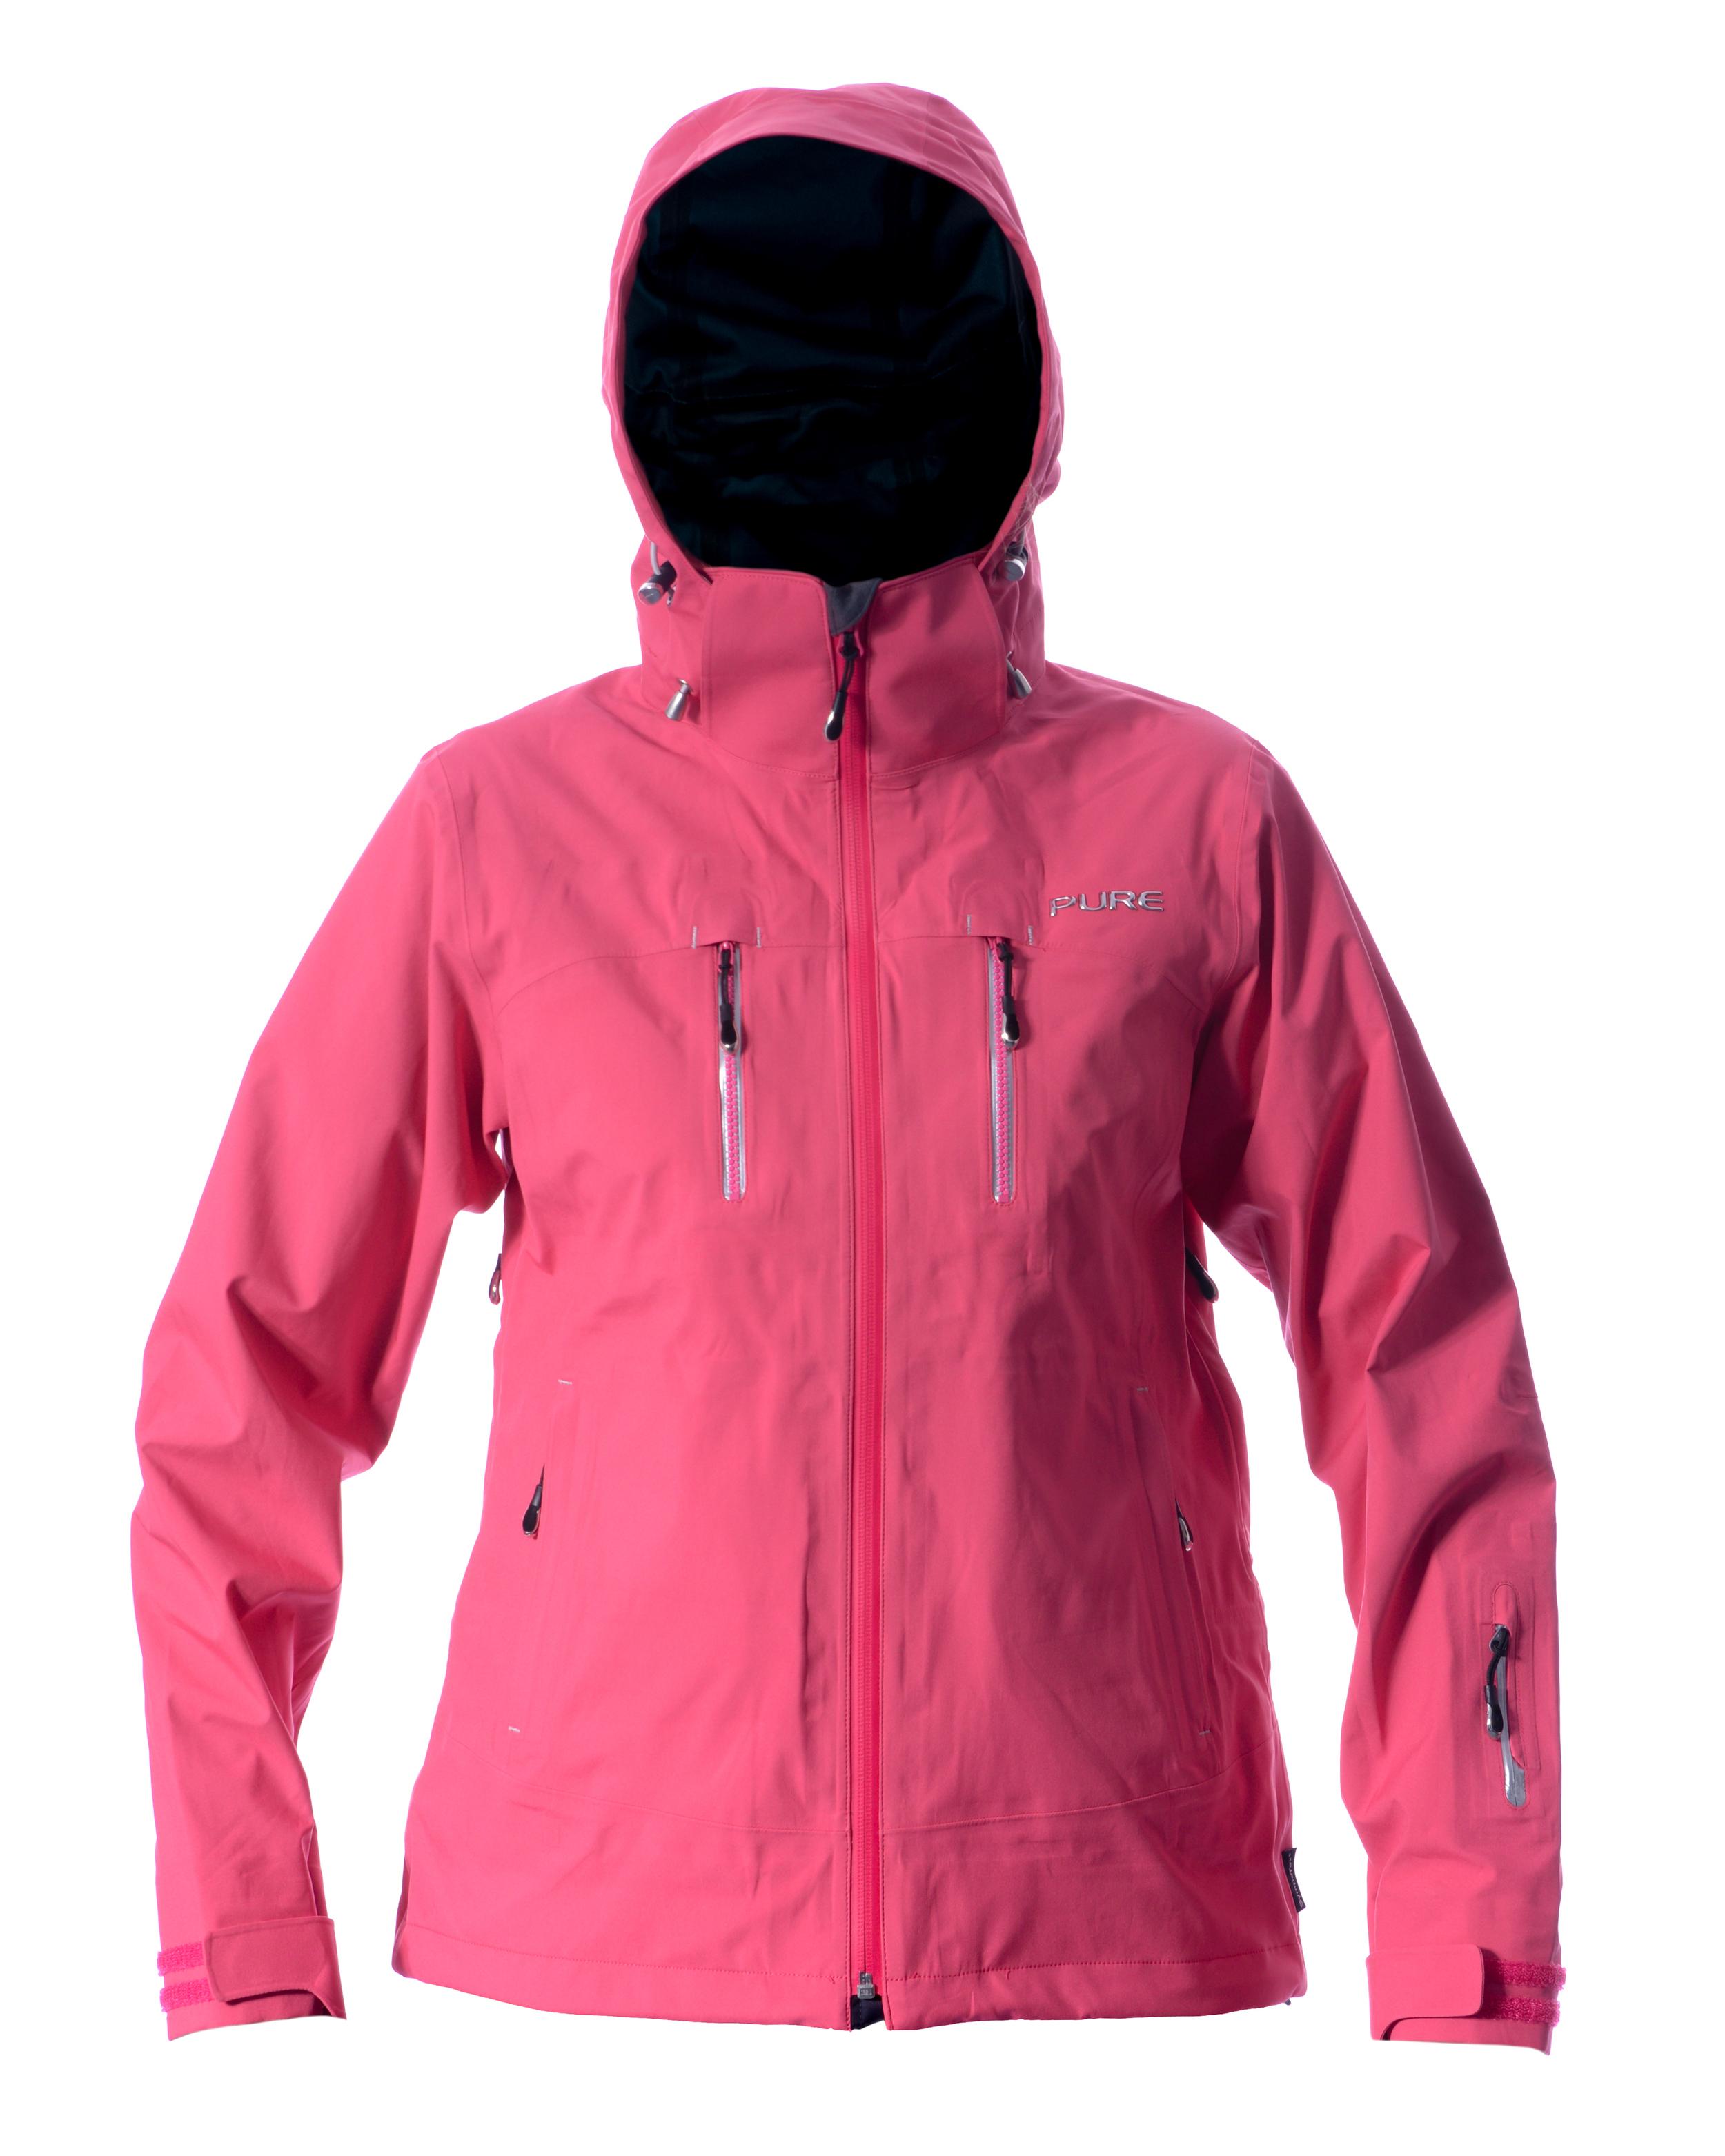 Monte Rosa Women's Pure Mountain - Raspberry